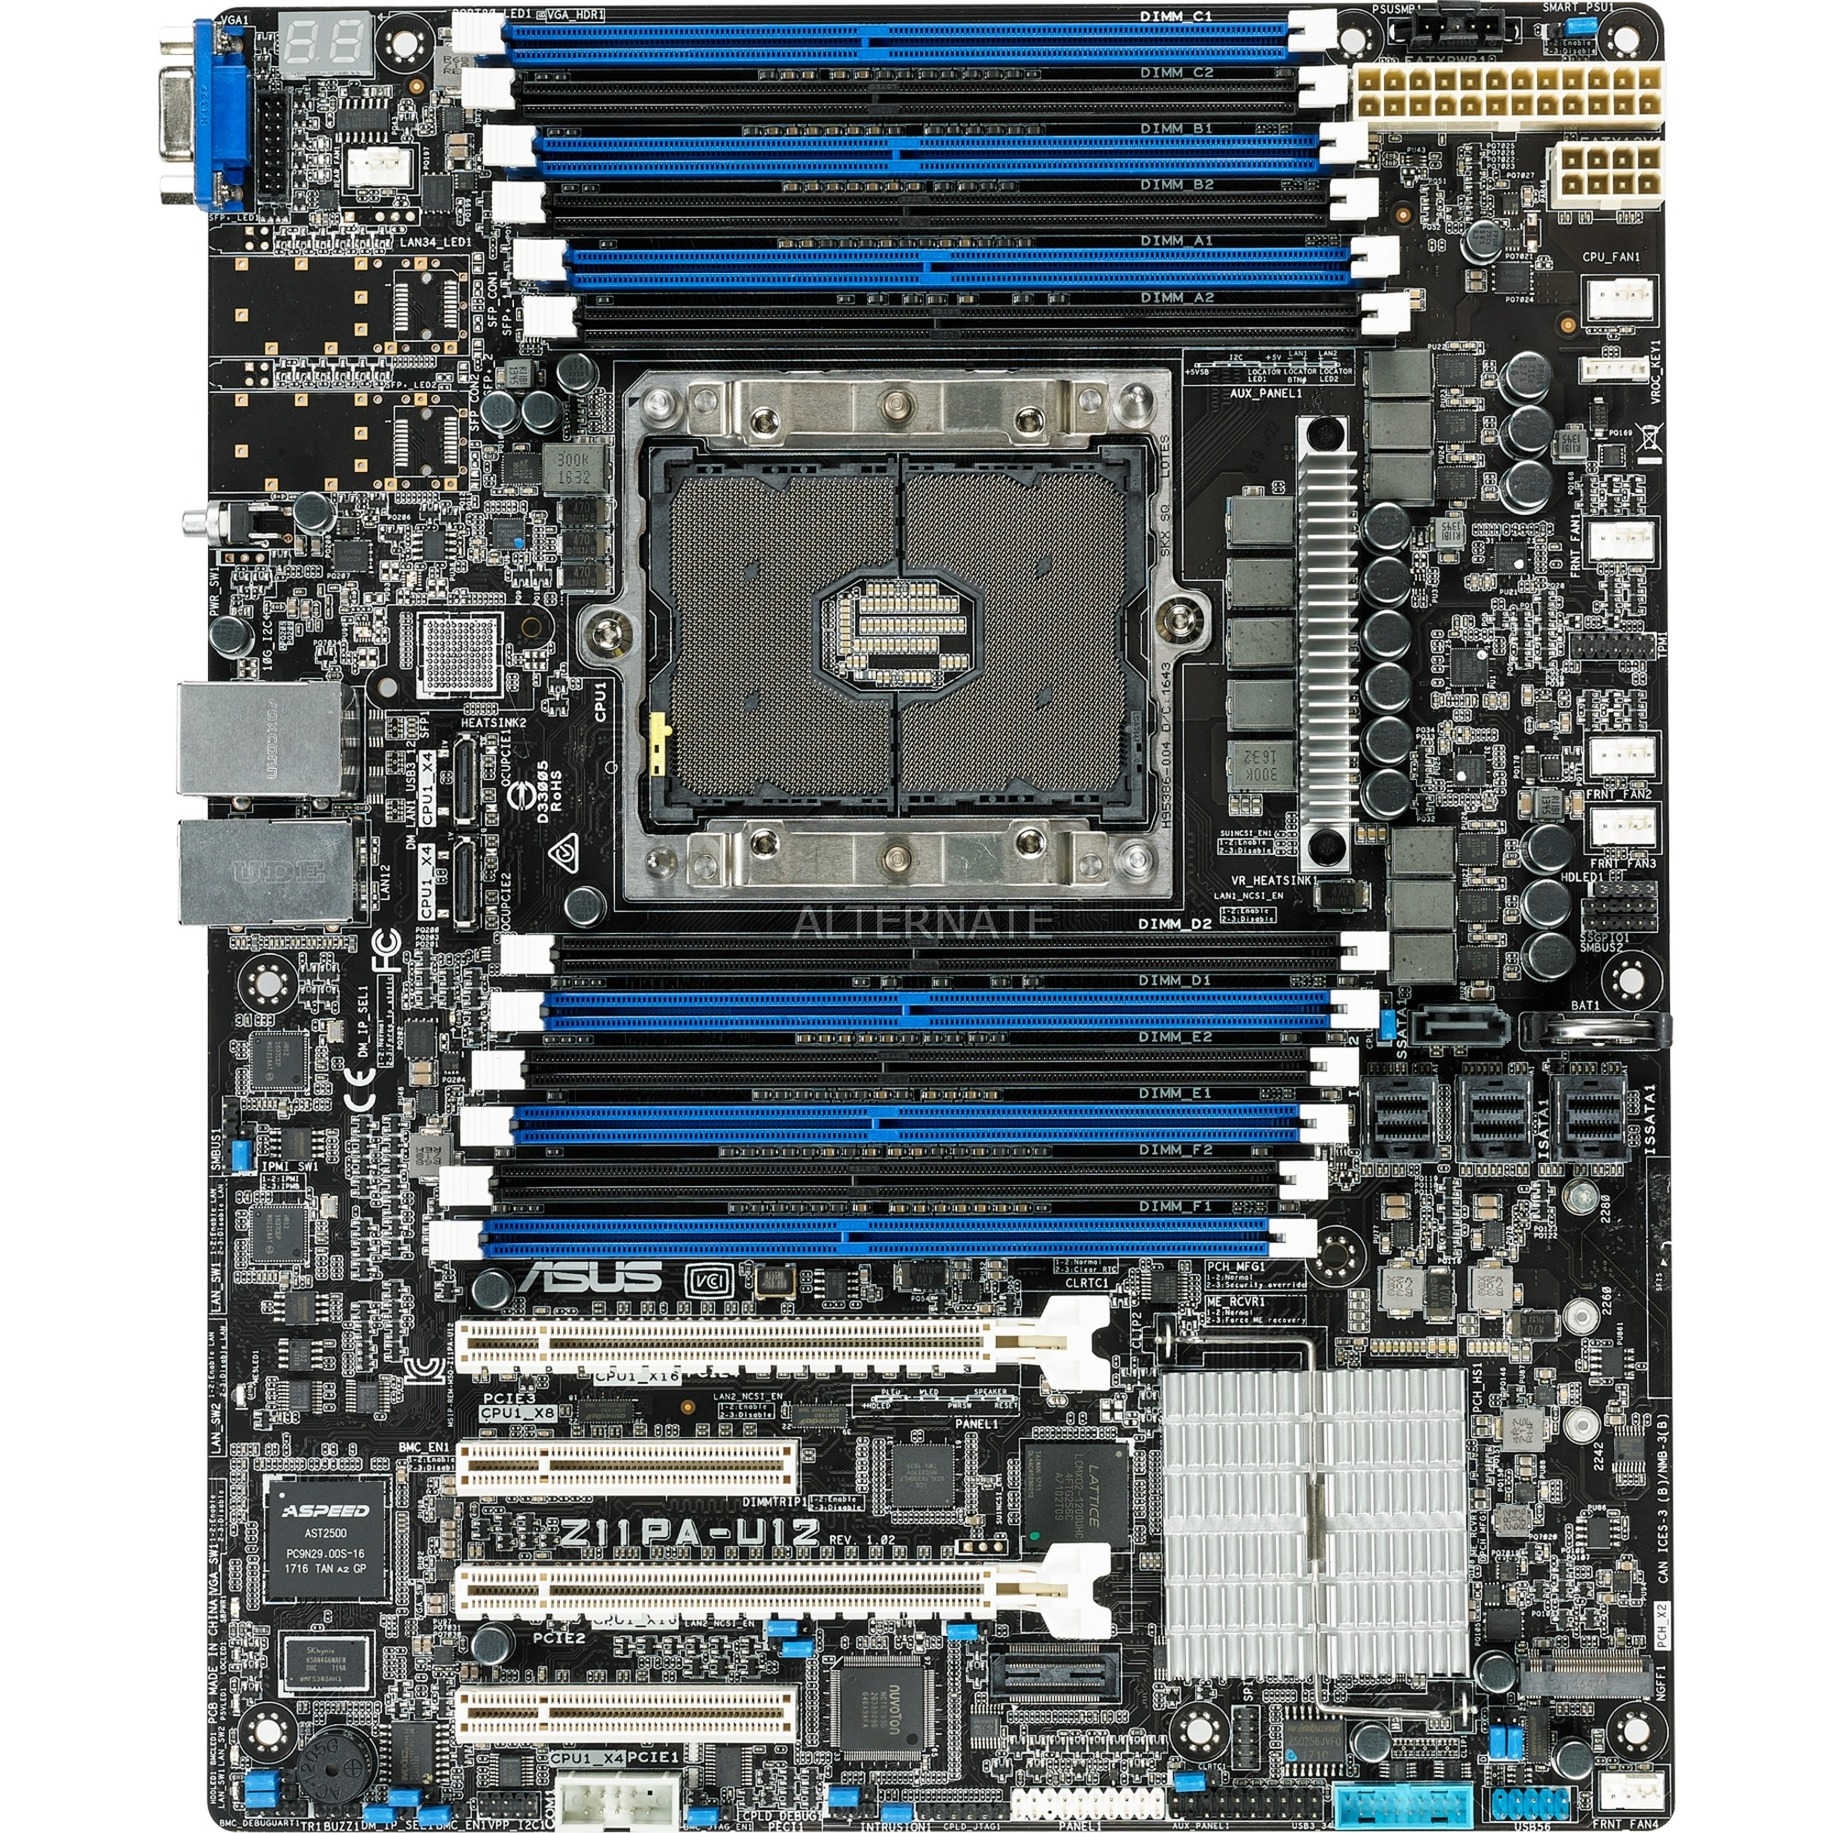 Z11PA-U12 Intel C621 ATX serveur/ station d'accueil carte mère